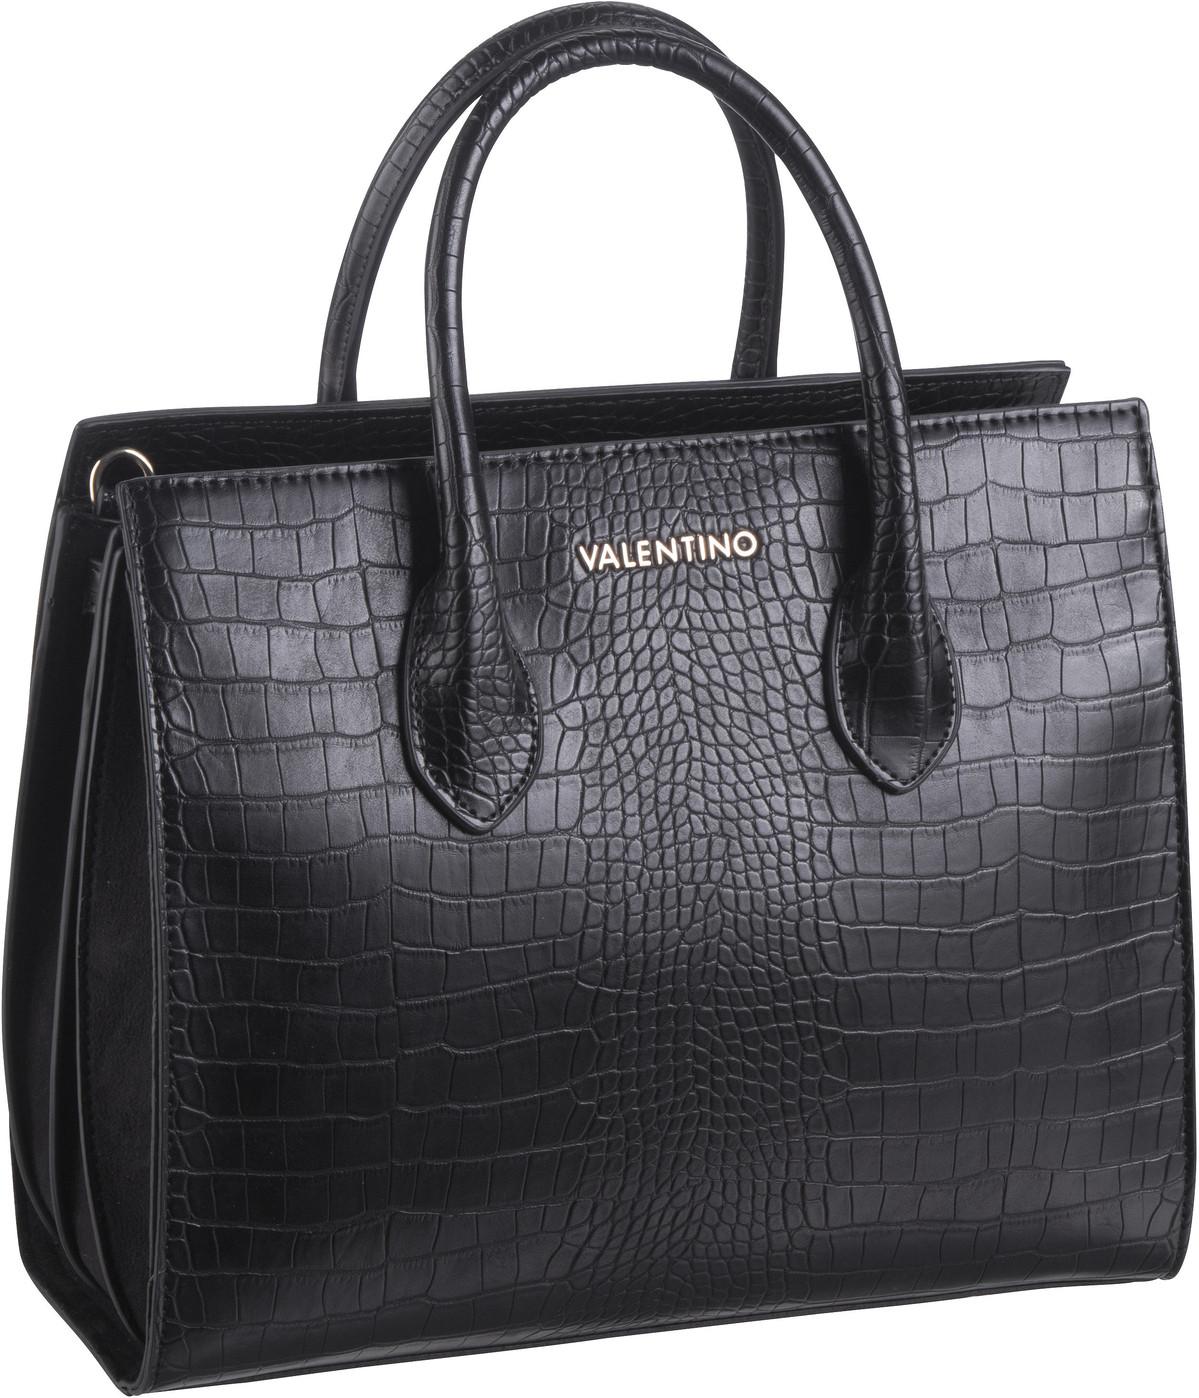 Bags Handtasche Summer Memento Shopping 101C Nero